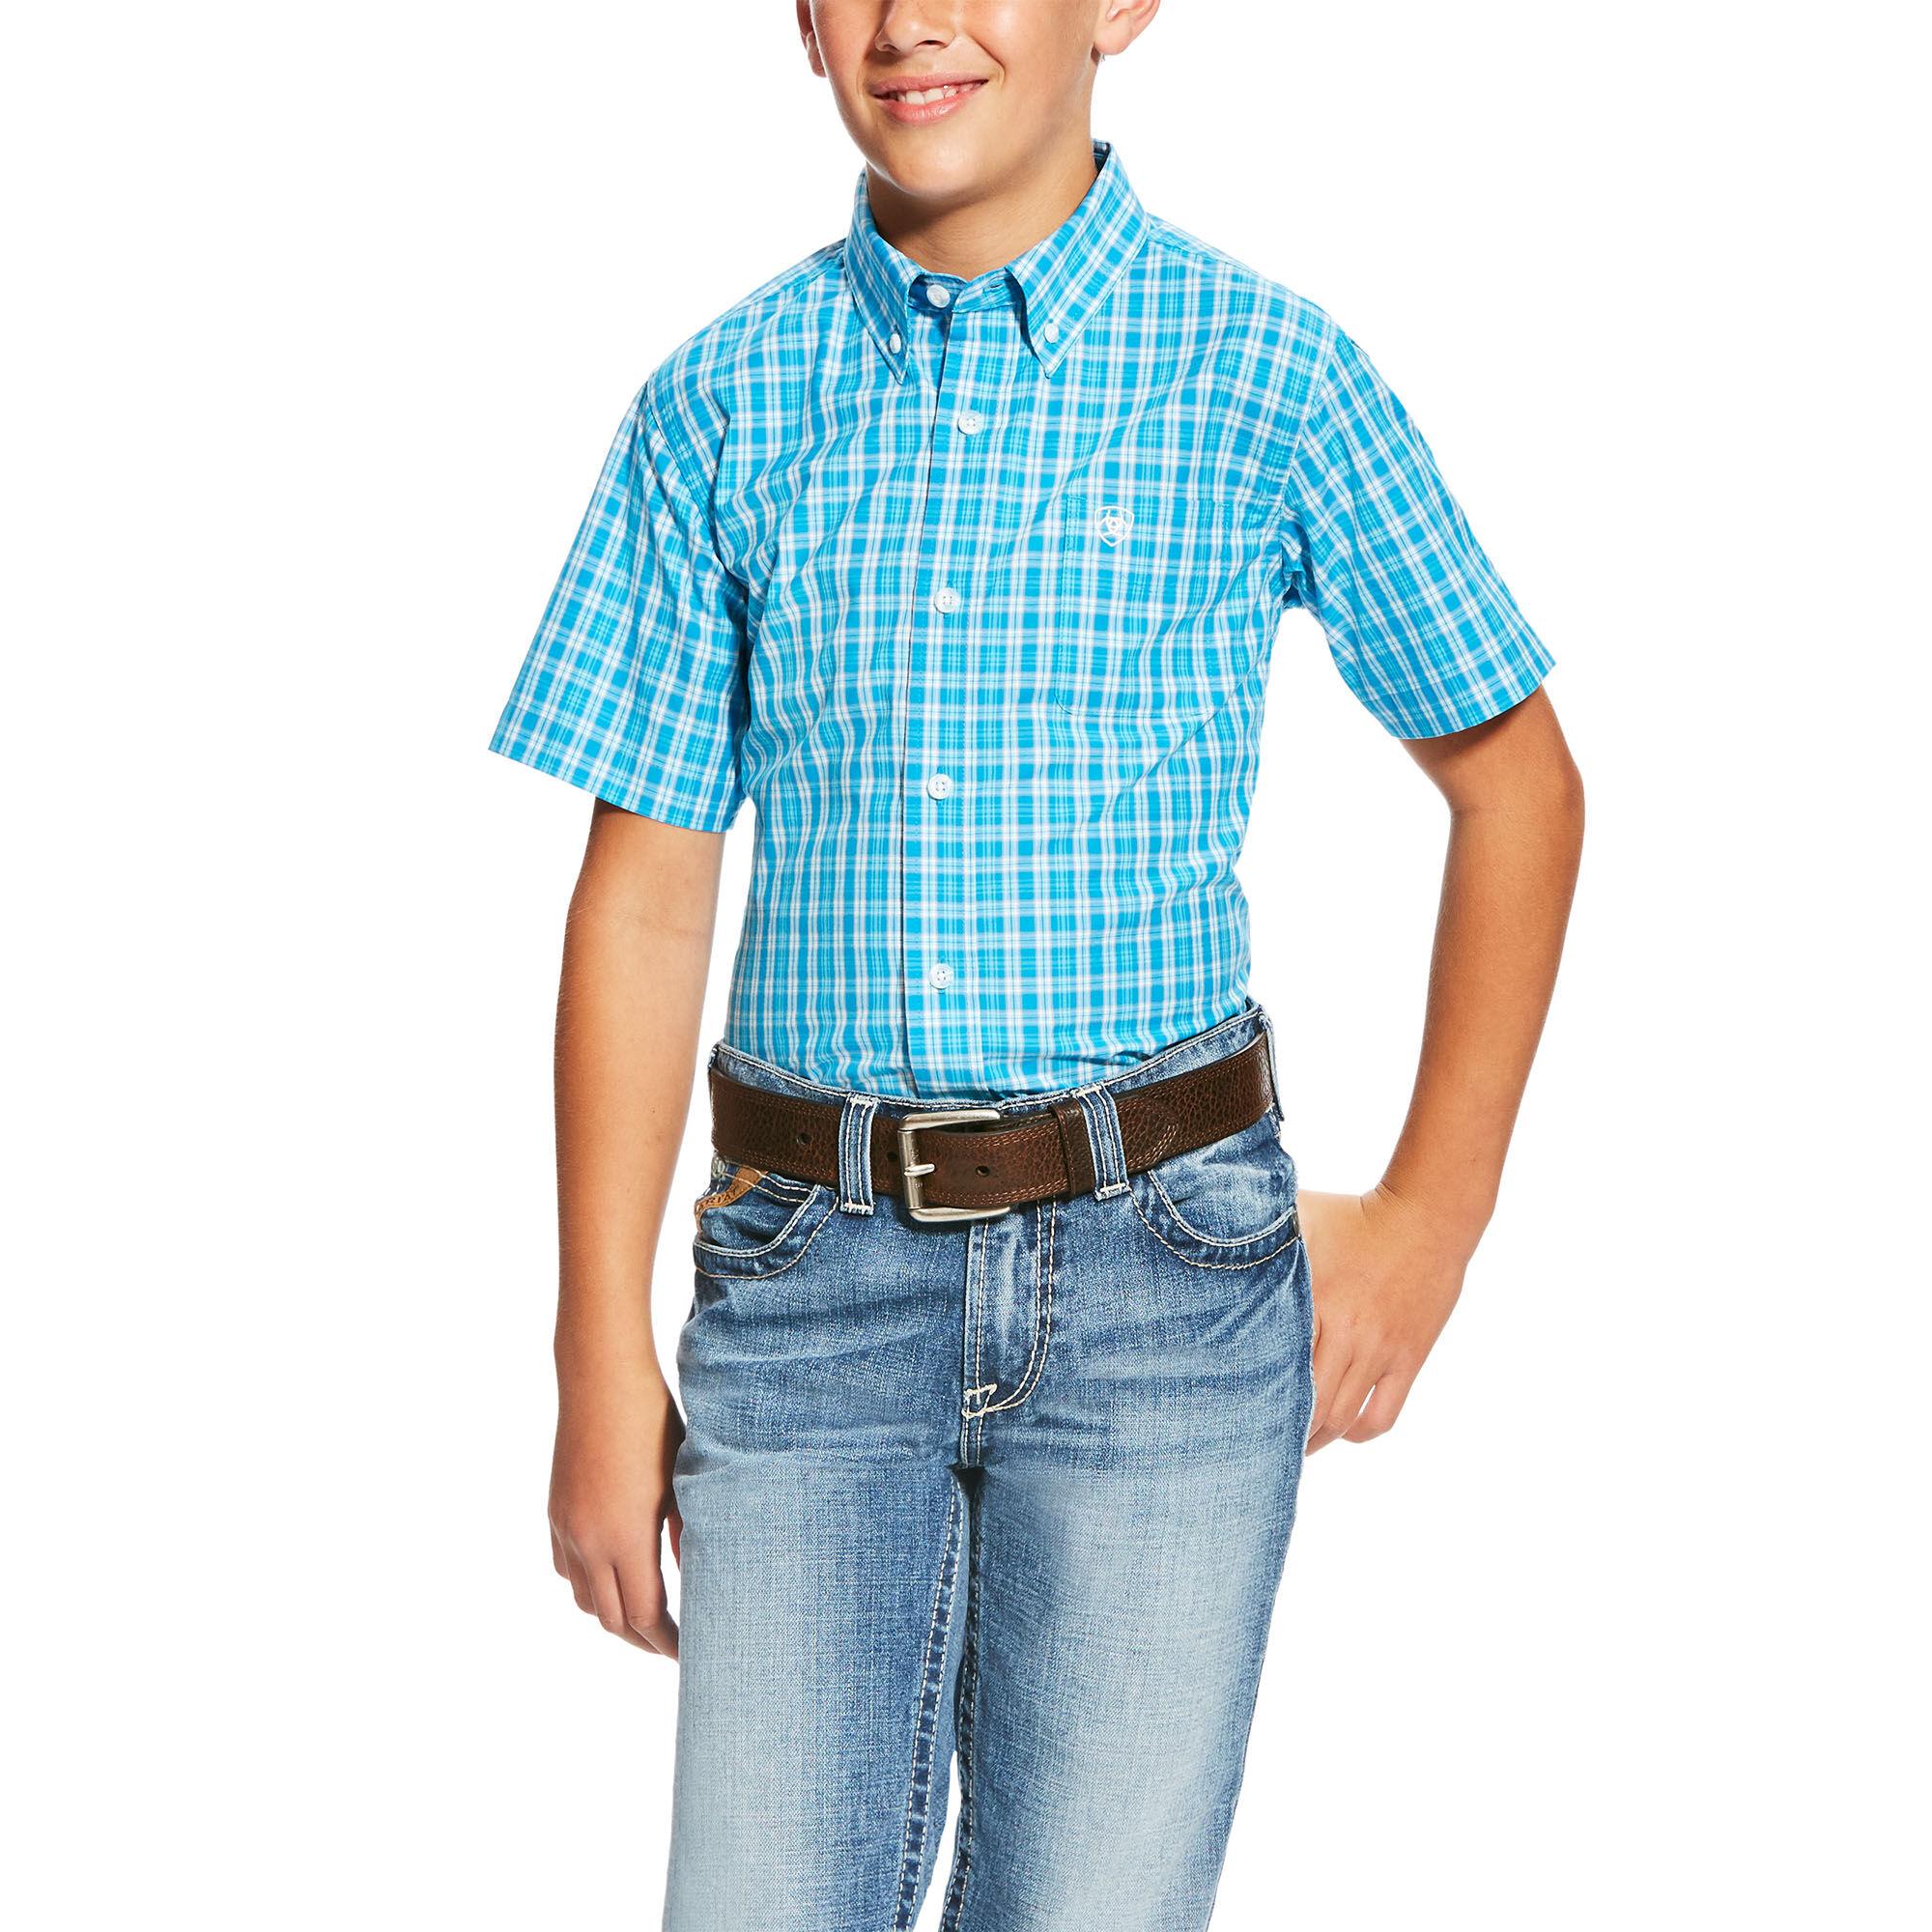 Pro Series Lawson Shirt